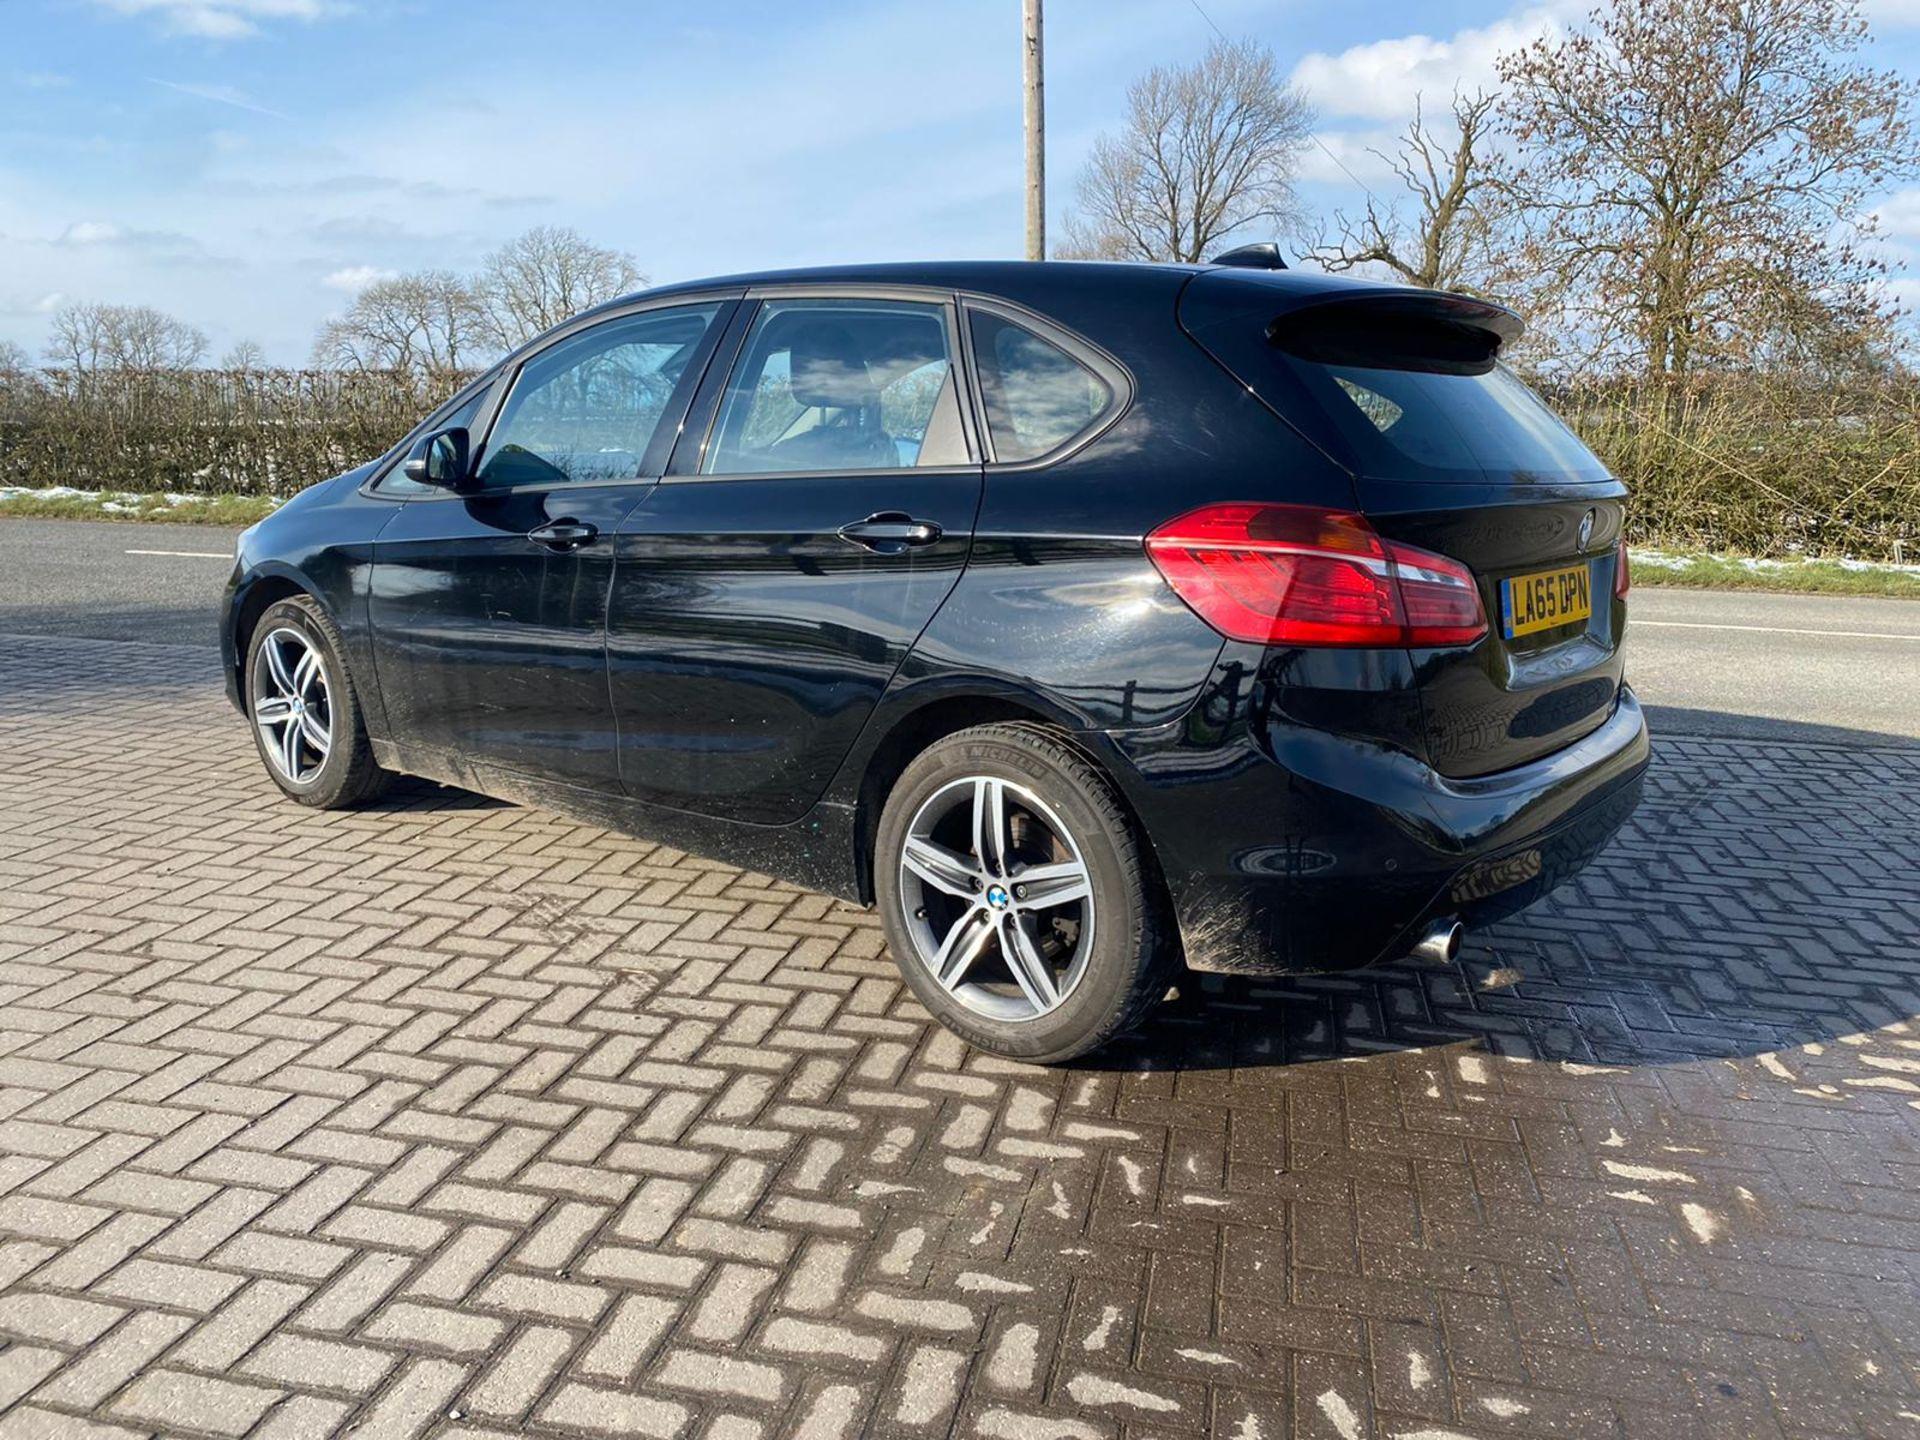 "ON SALE BMW 218d ""SPORT"" MPV 2.0 DIESEL ""EURO 6"" (2016 REG) - 1 OWNER - GREAT SPEC - BLACK - LOOK!! - Image 2 of 16"